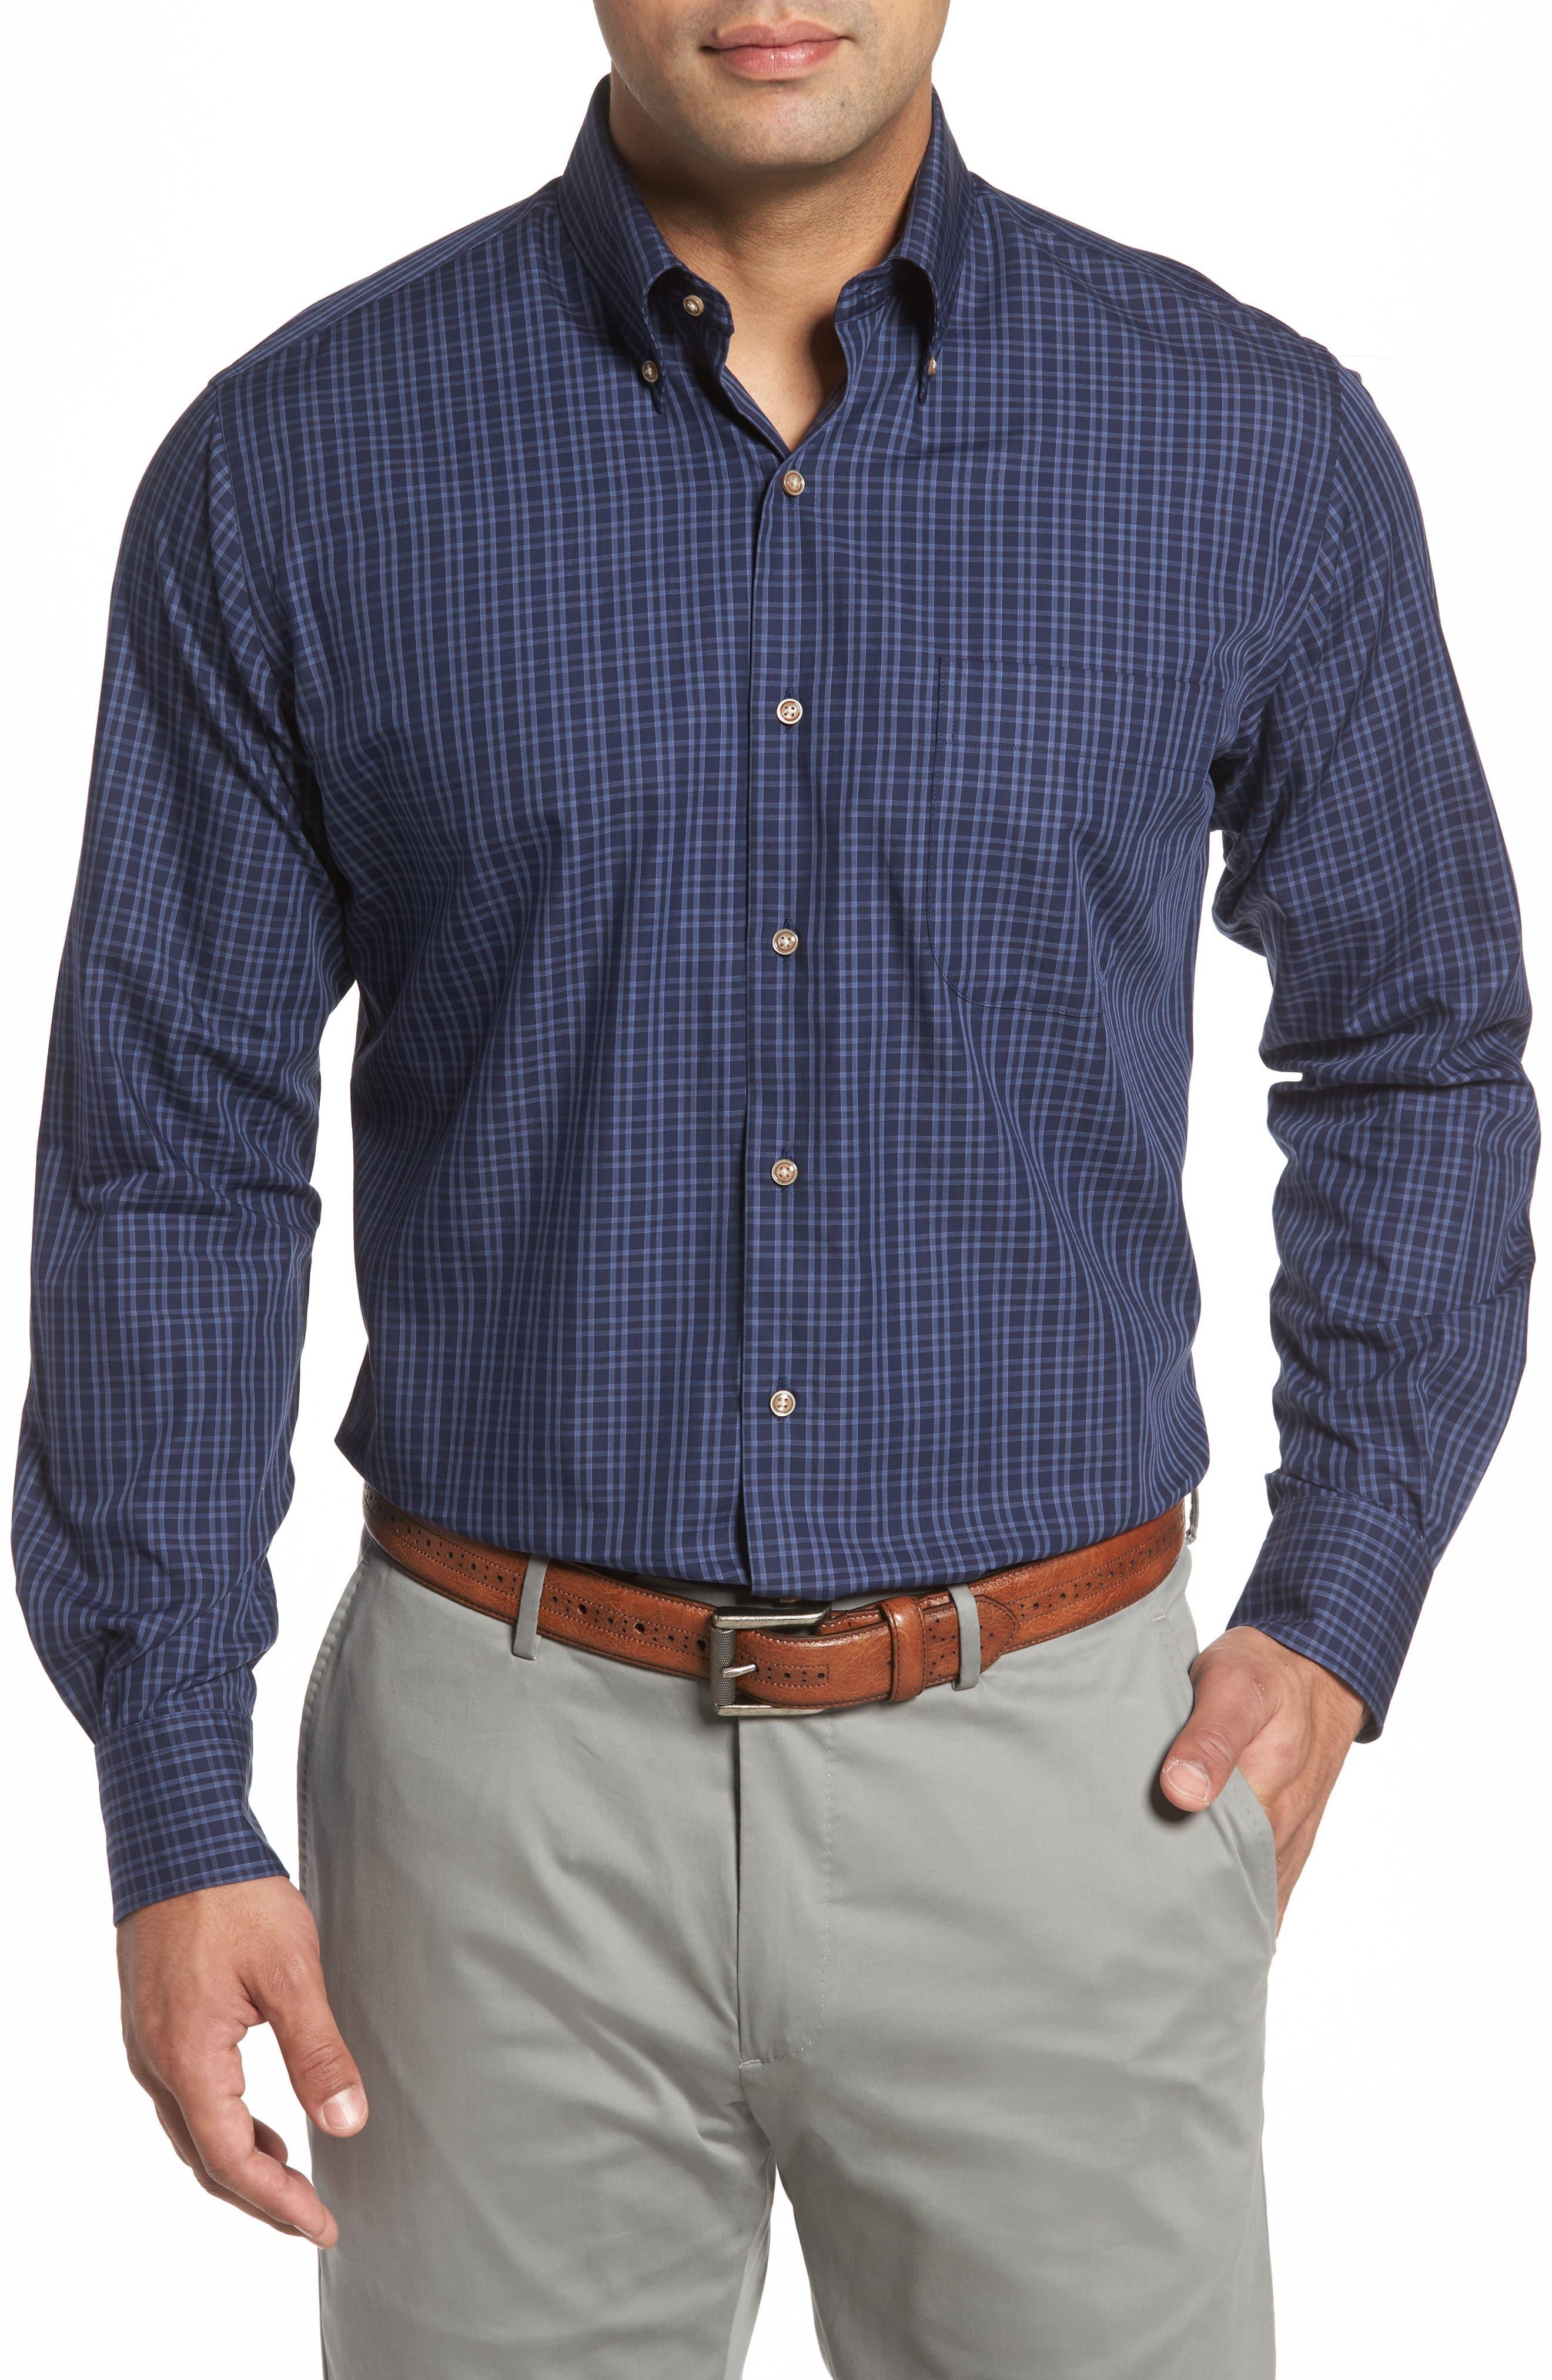 Alternate Image 1 Selected - Peter Millar Autumn Check Regular Fit Sport Shirt